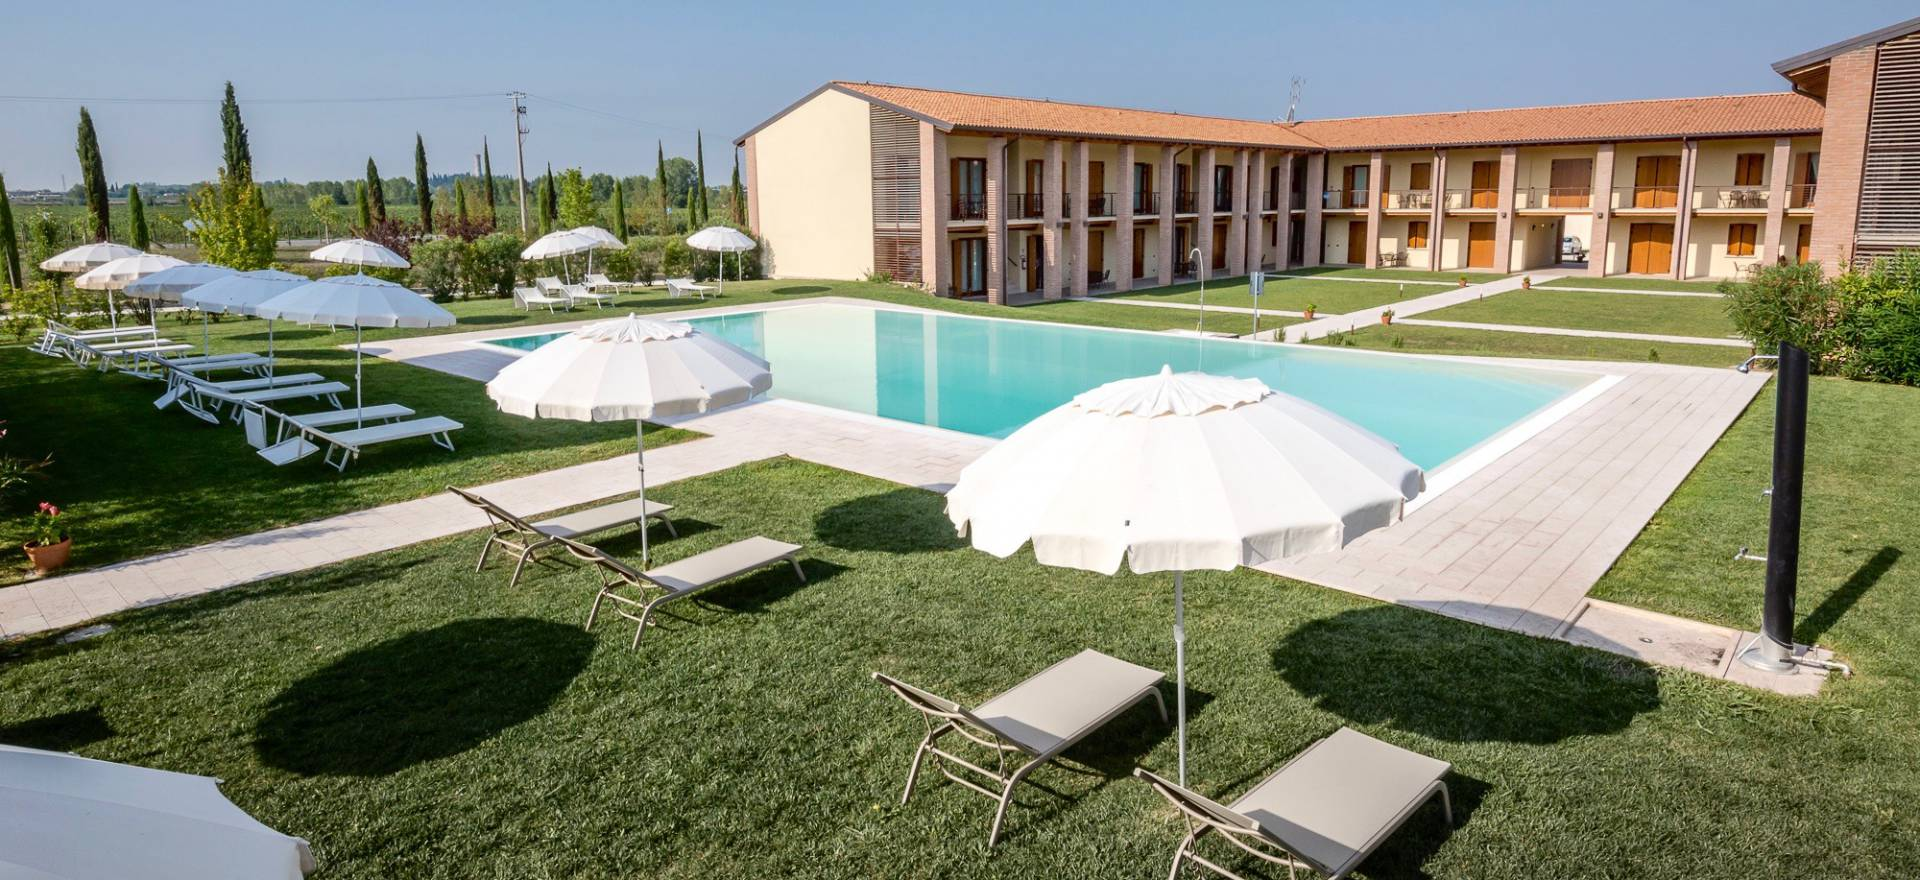 Agriturismo Lake Como and Lake Garda Family agriturismo Lake Garda with large pool